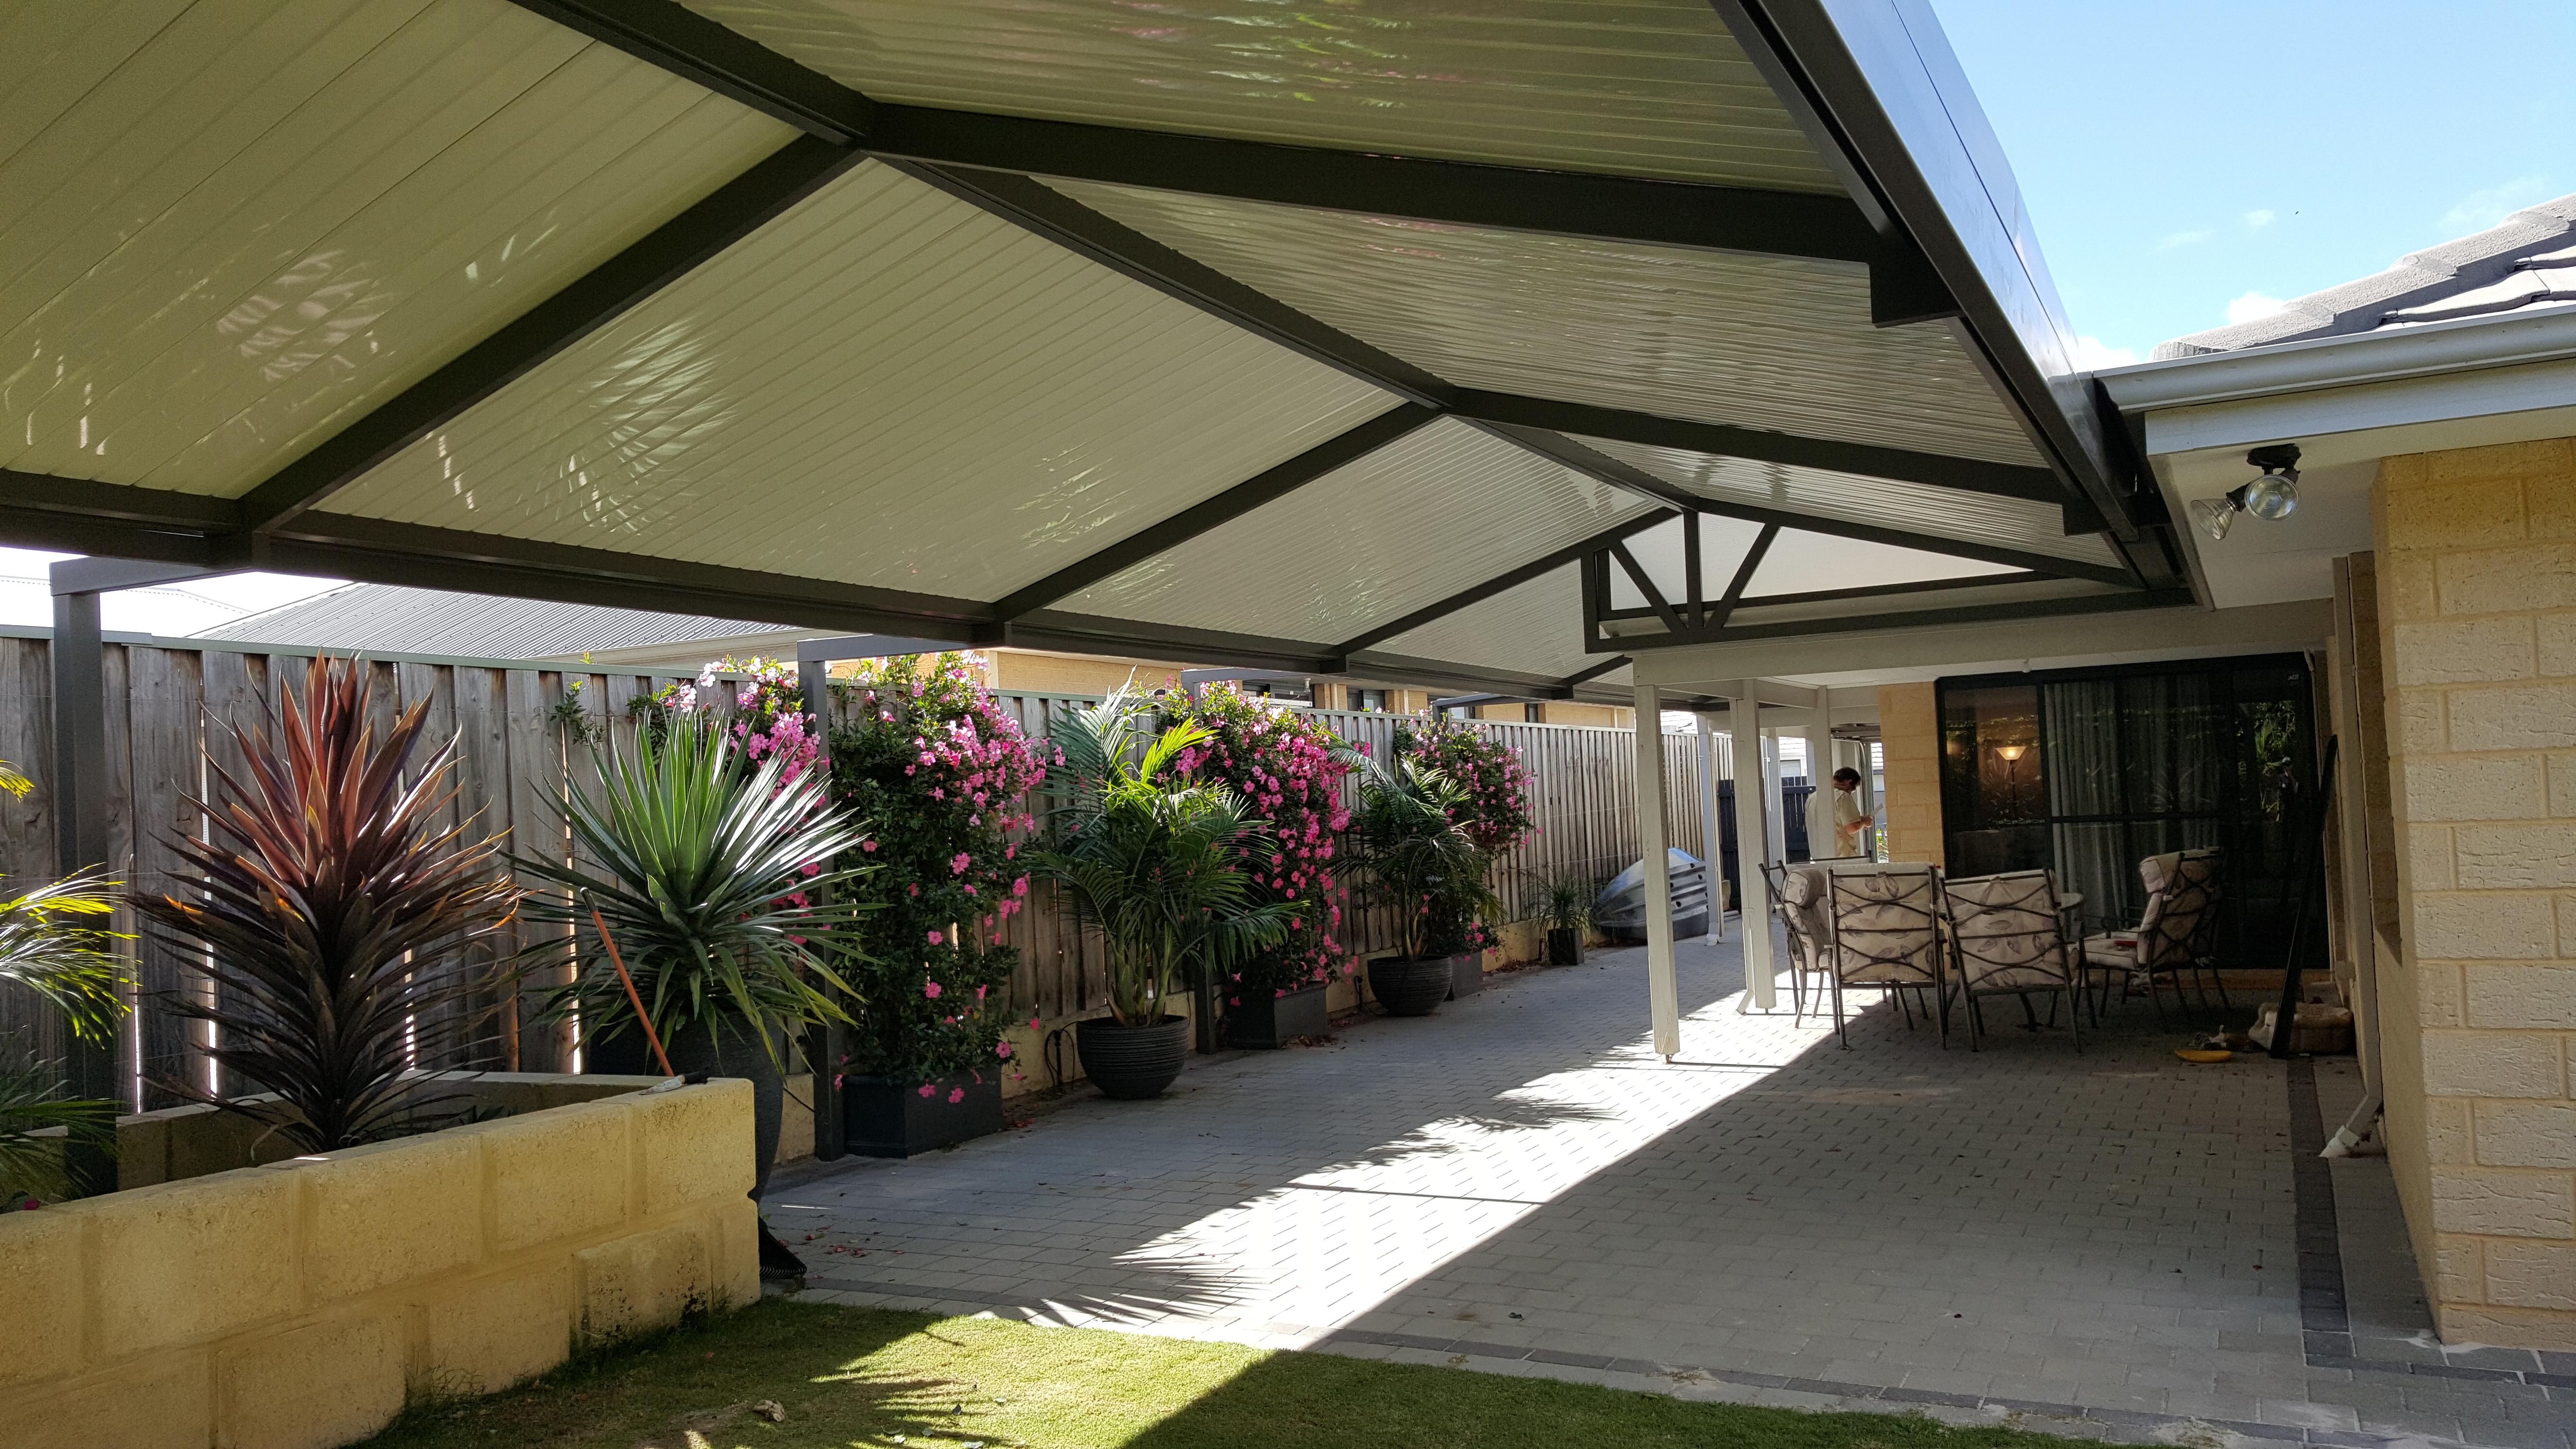 Gable patio design in ellenbrook perth great aussie patios for Gable patio designs